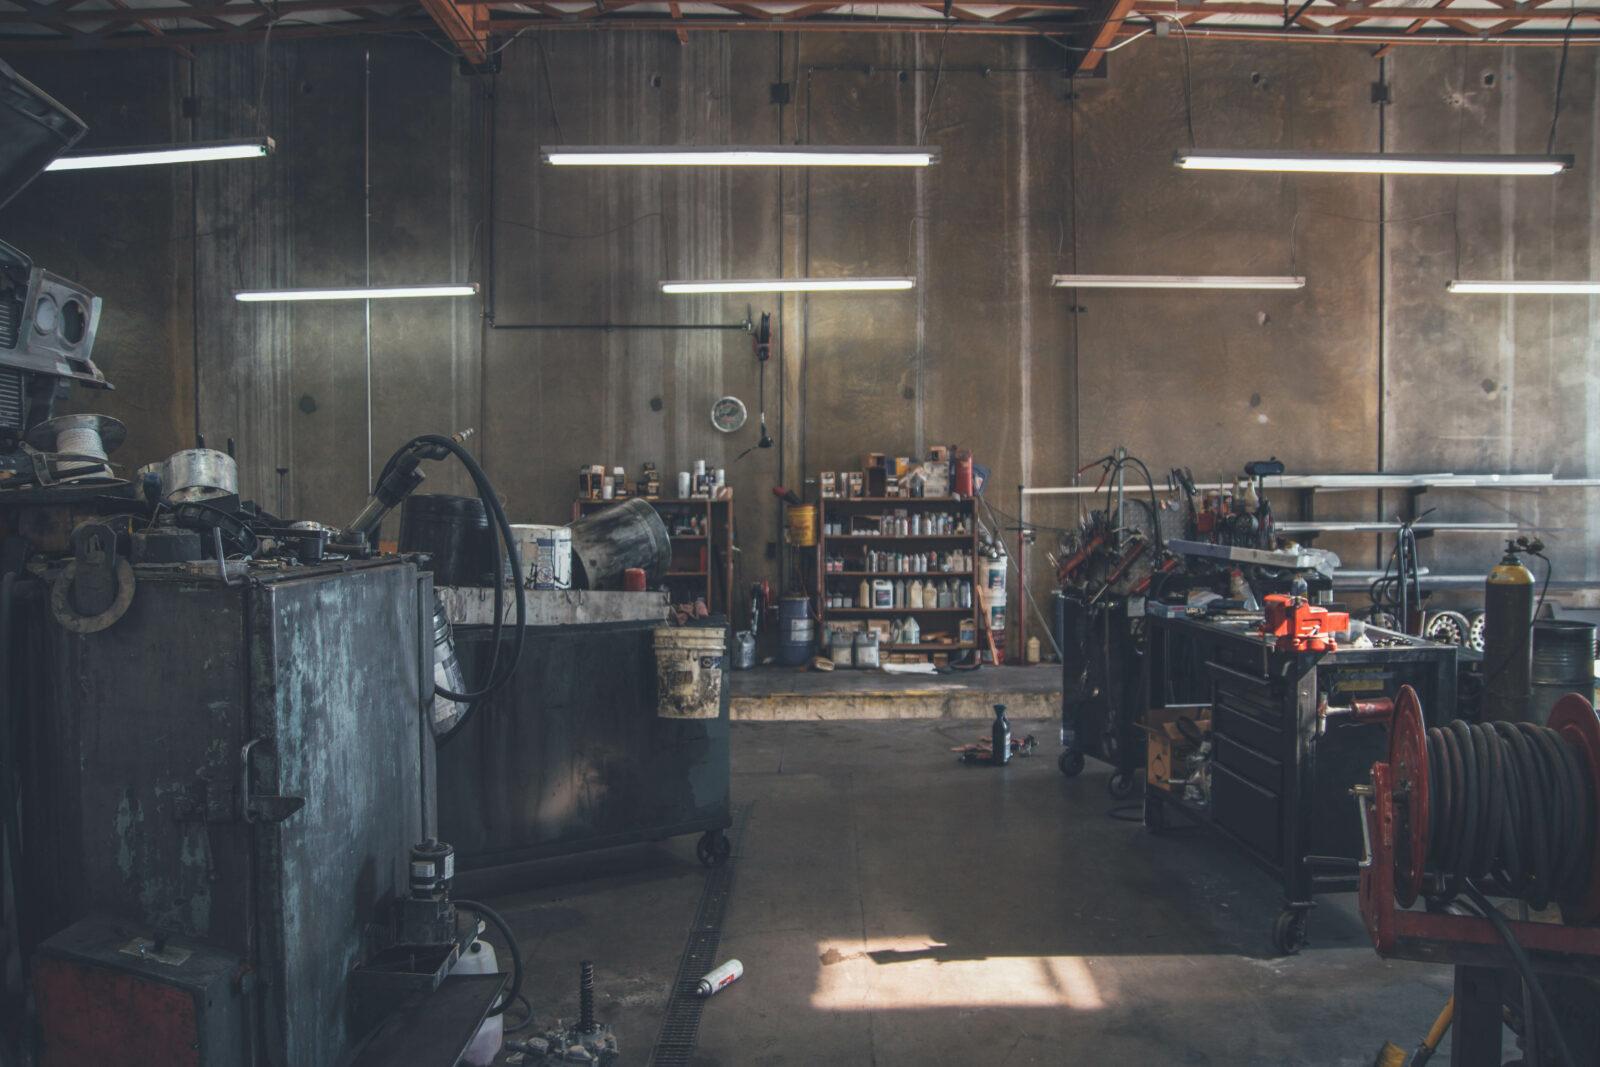 DC Compressors by Secop